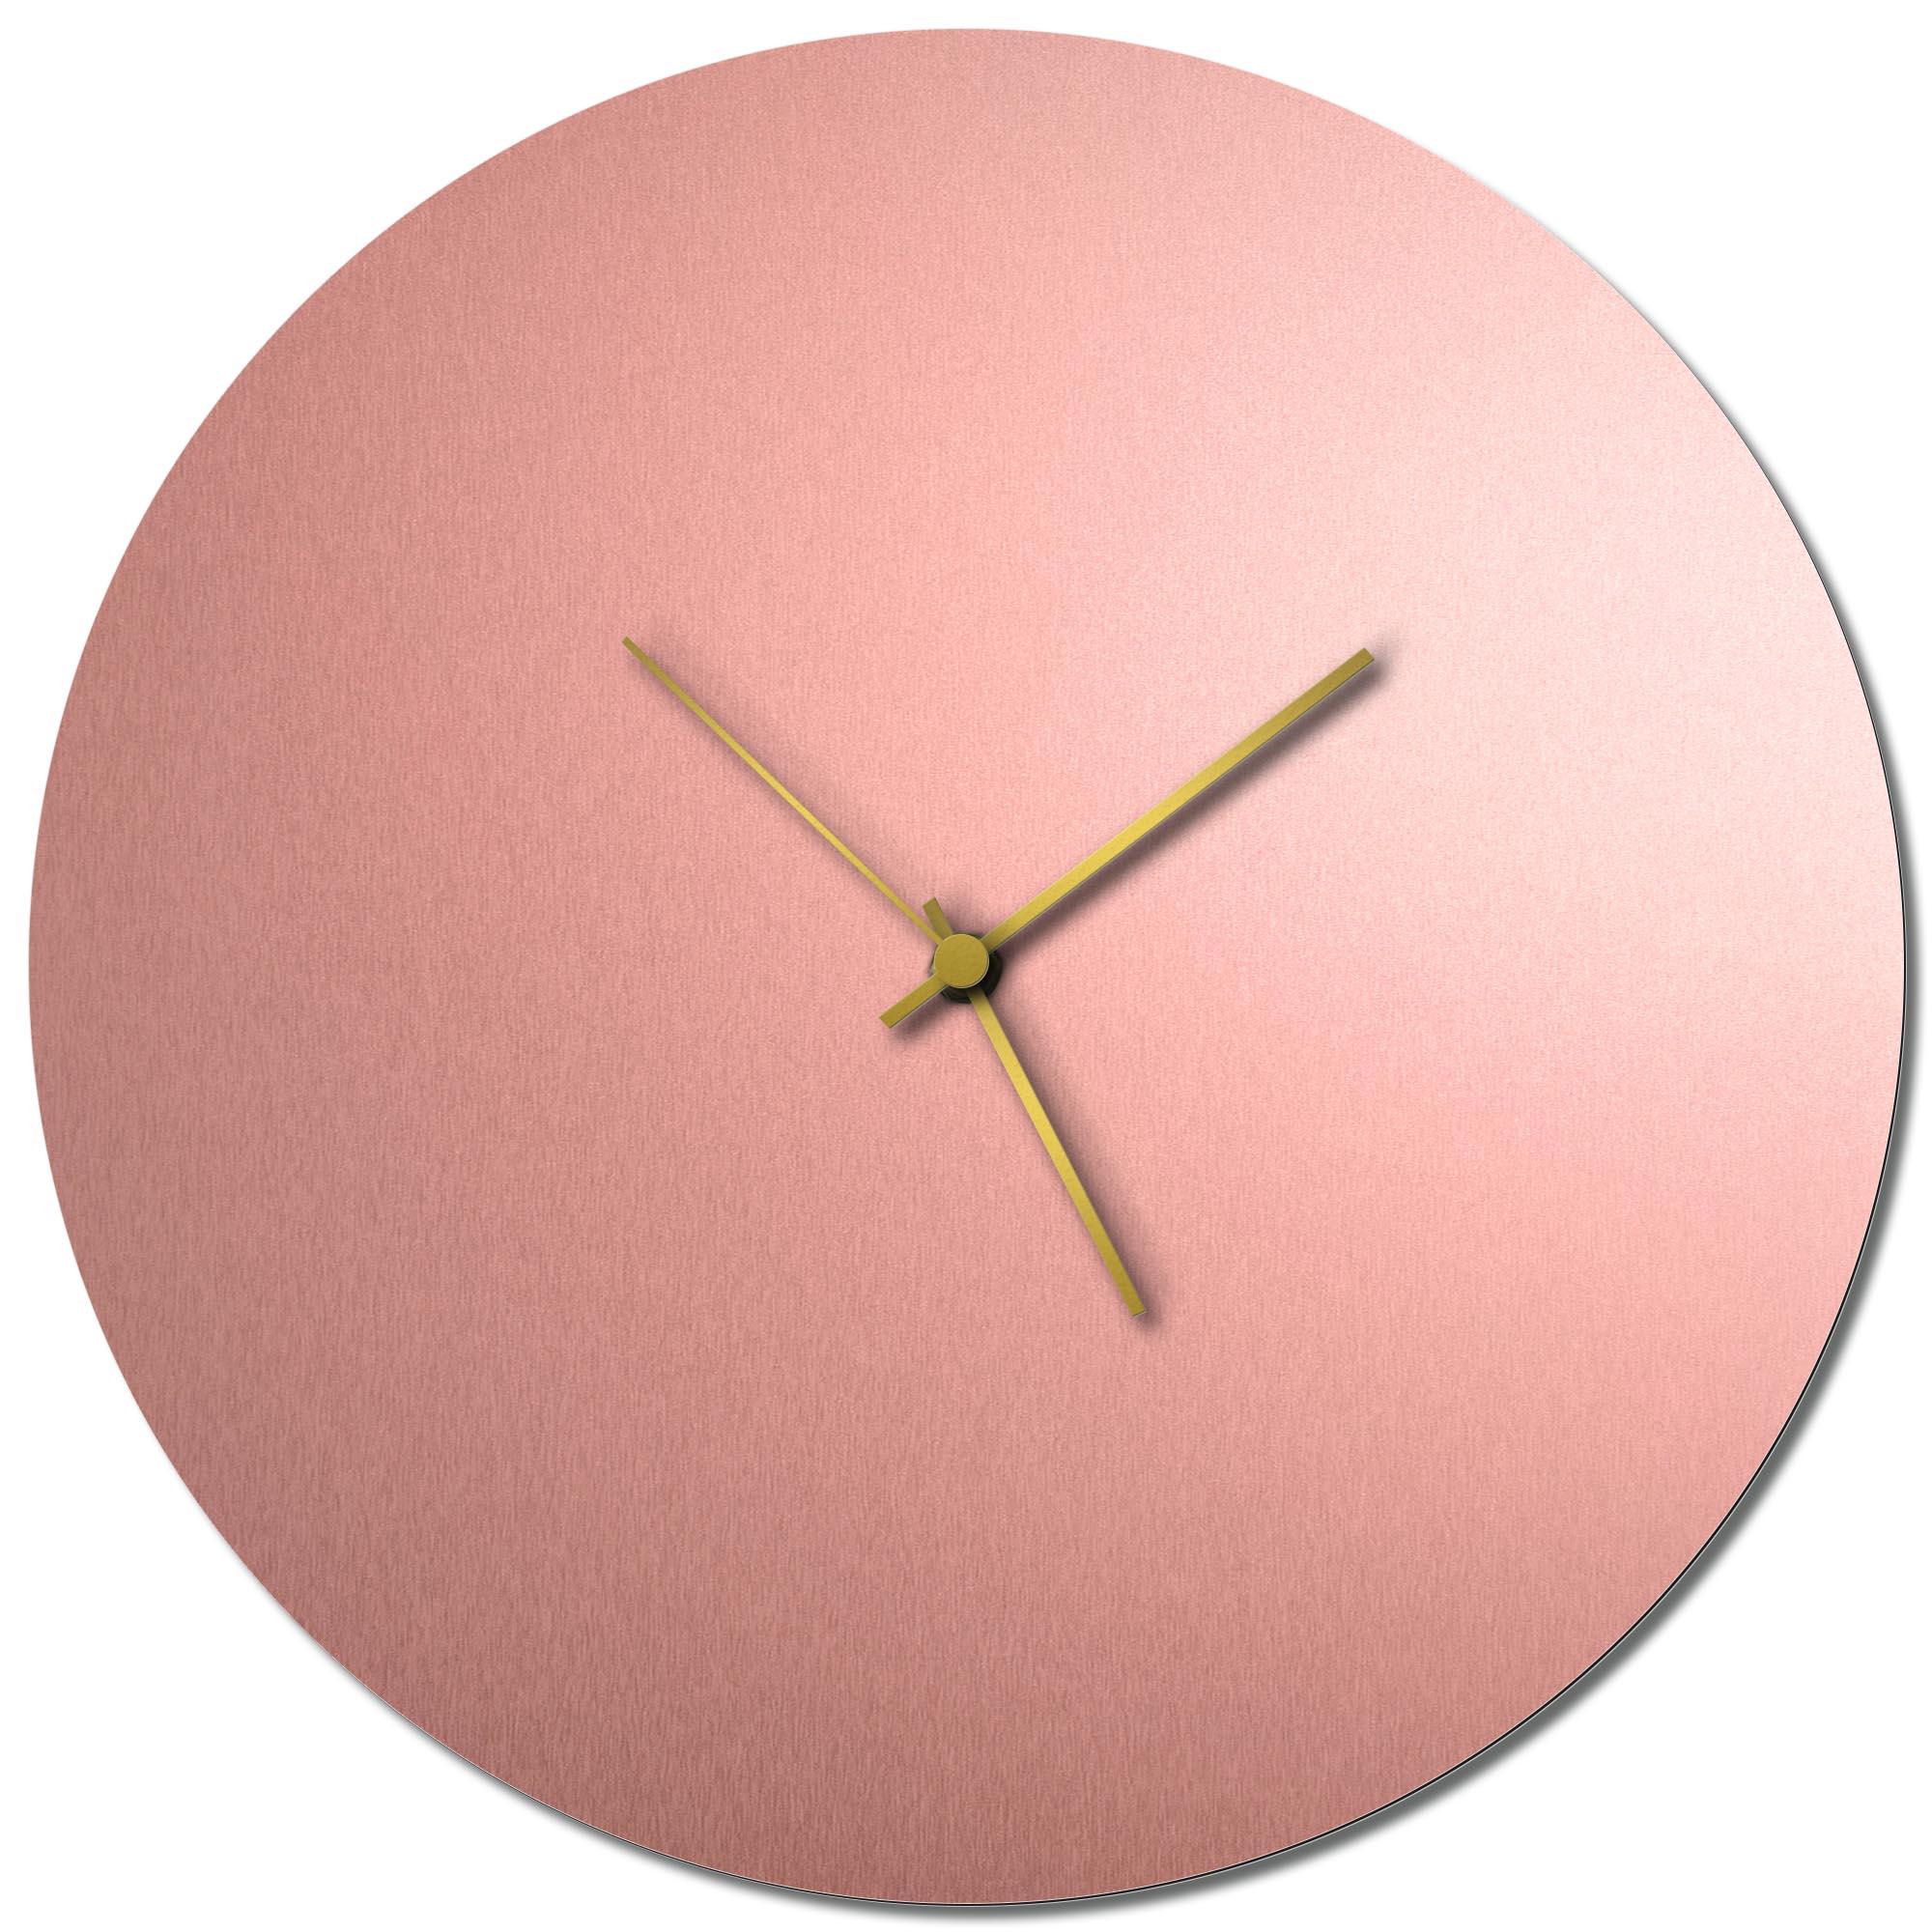 Adam Schwoeppe 'Coppersmith Circle Clock Gold' Midcentury Modern Style Wall Clock